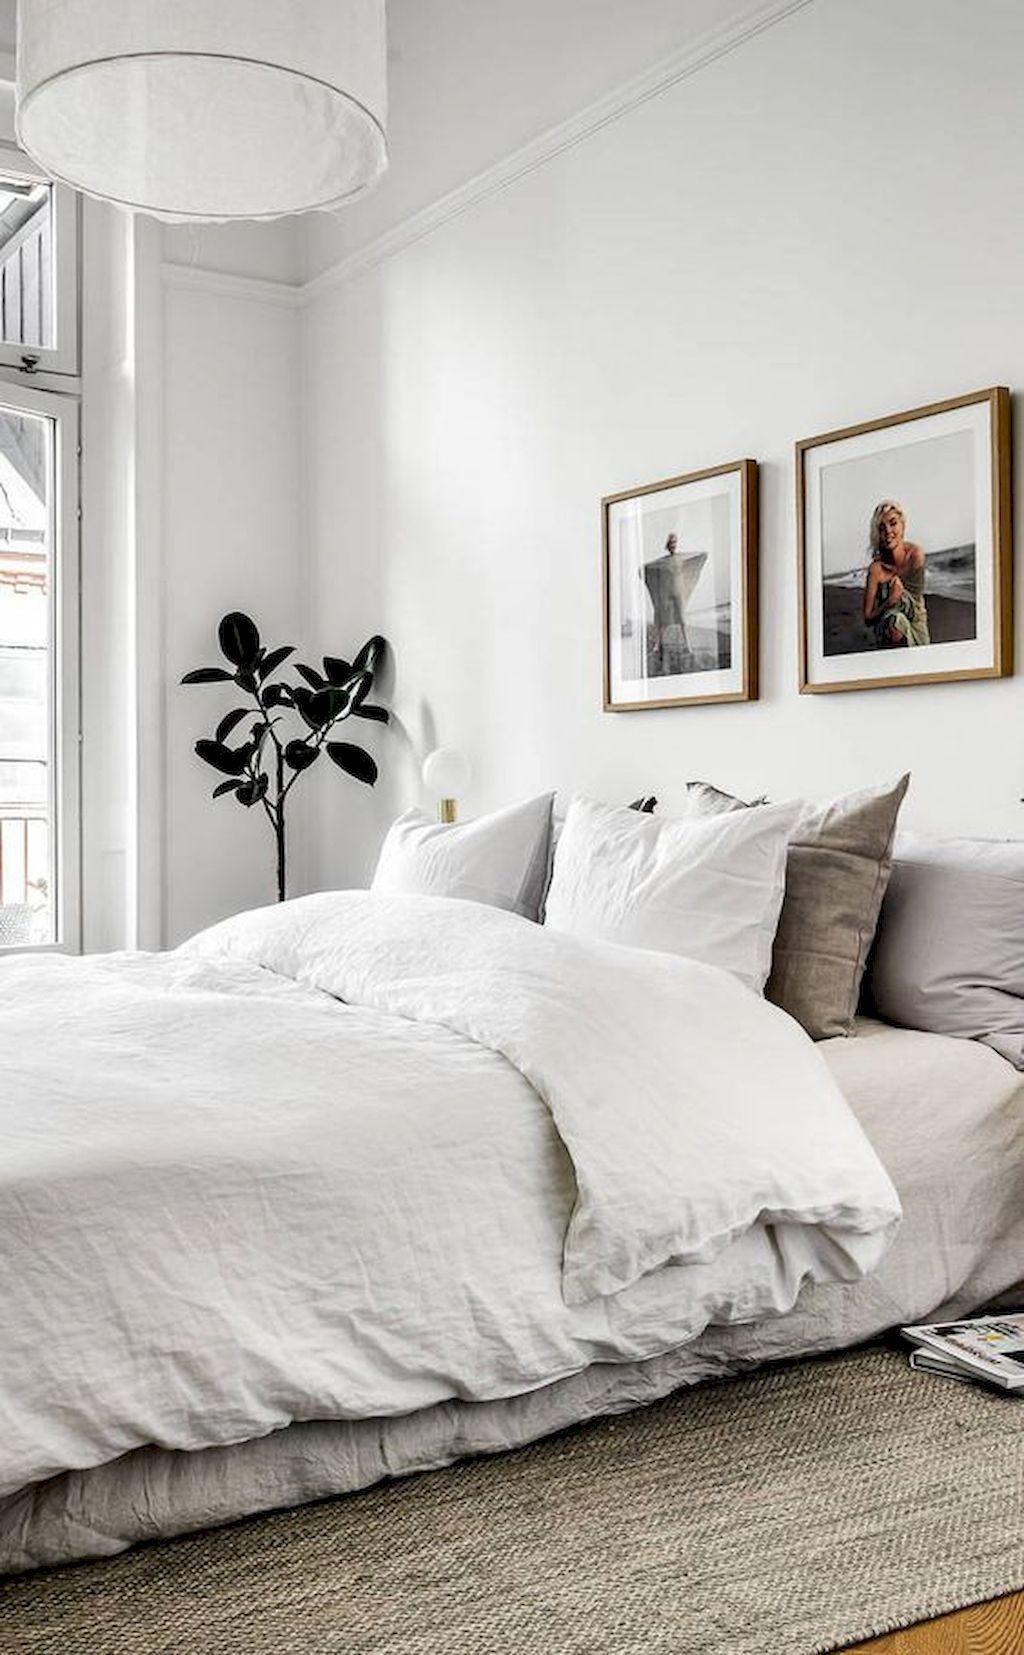 60 Simple and Elegance Scandinavian Bedroom Designs